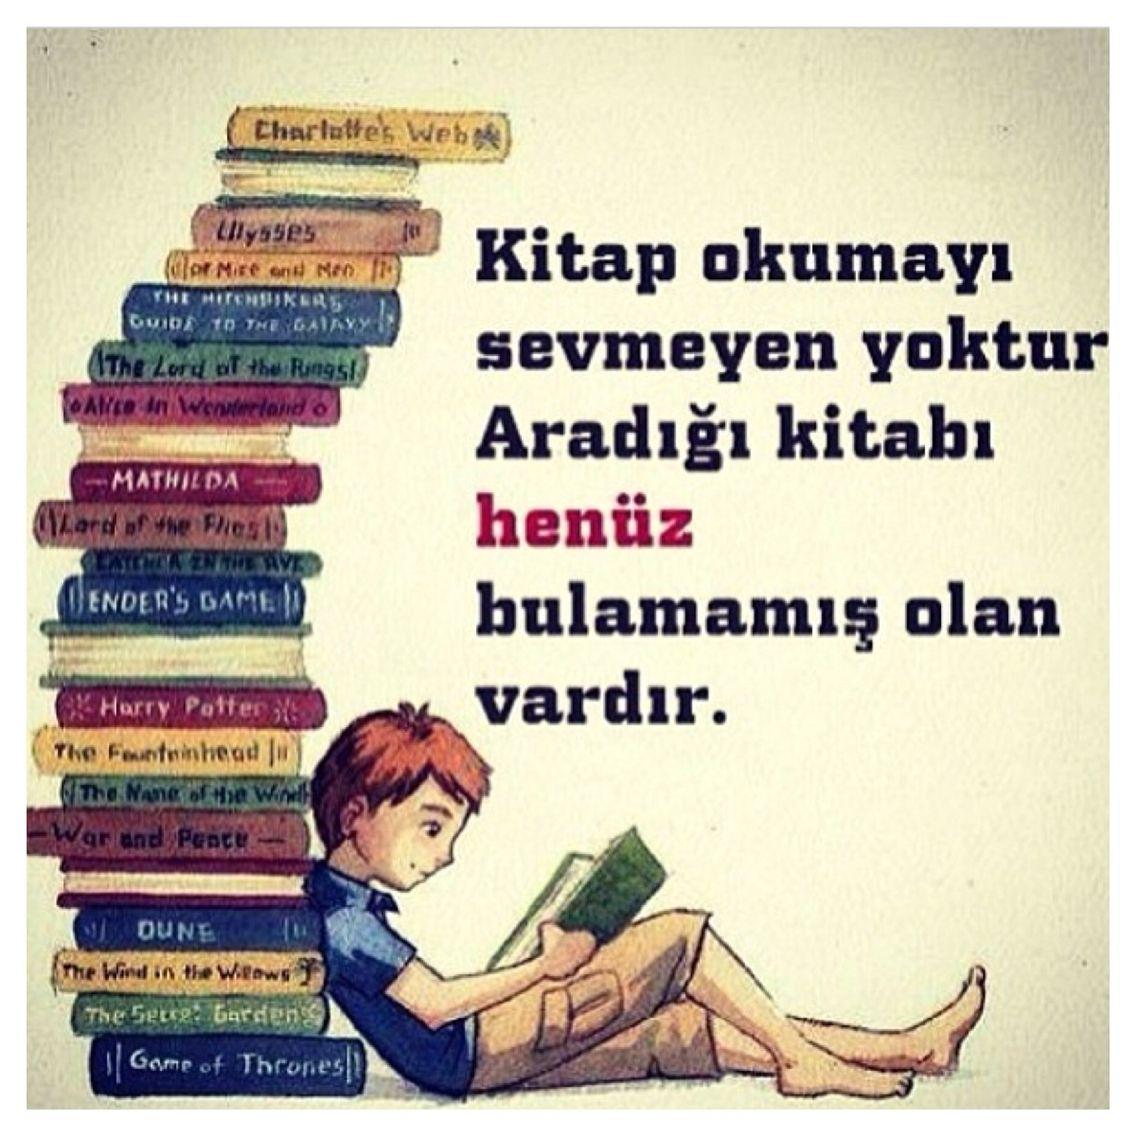 Kitap Okumanın Faydaları Sloganlar